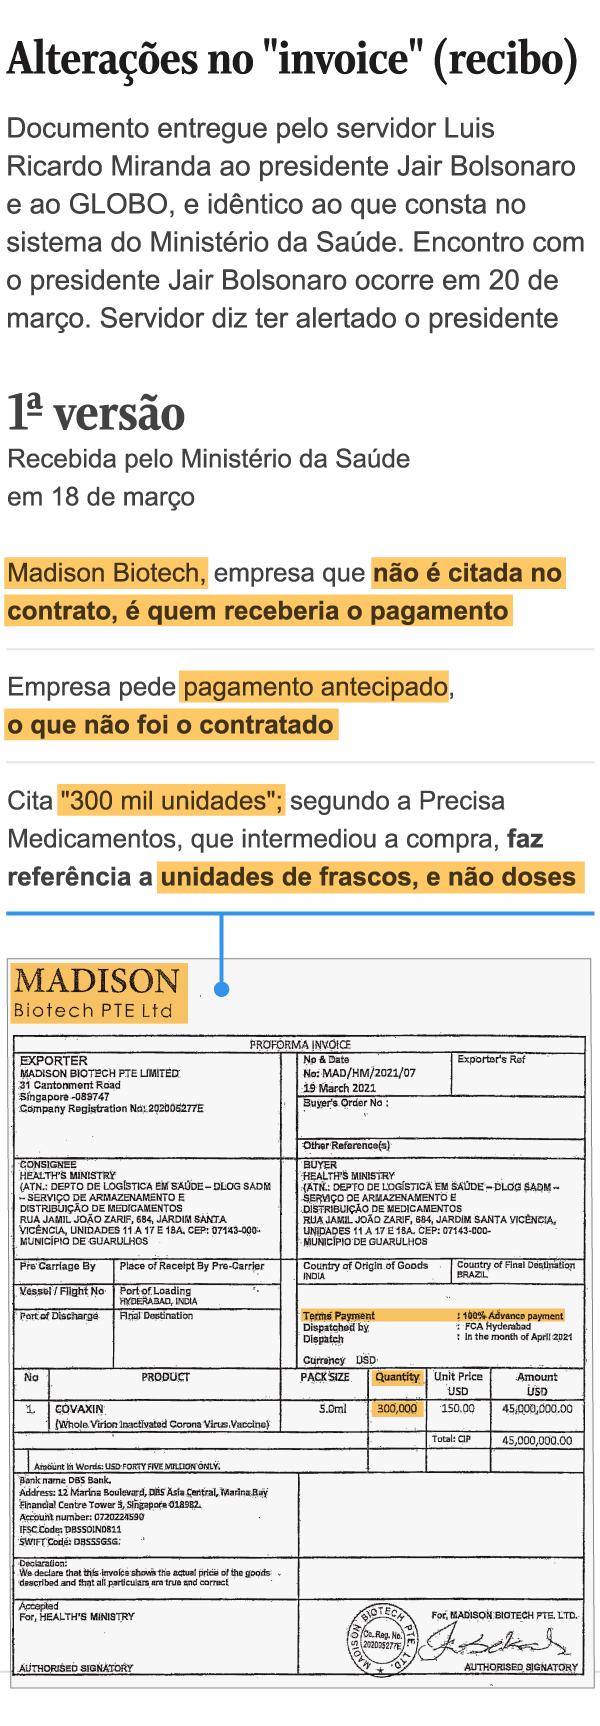 info covaxin doc1 mobi